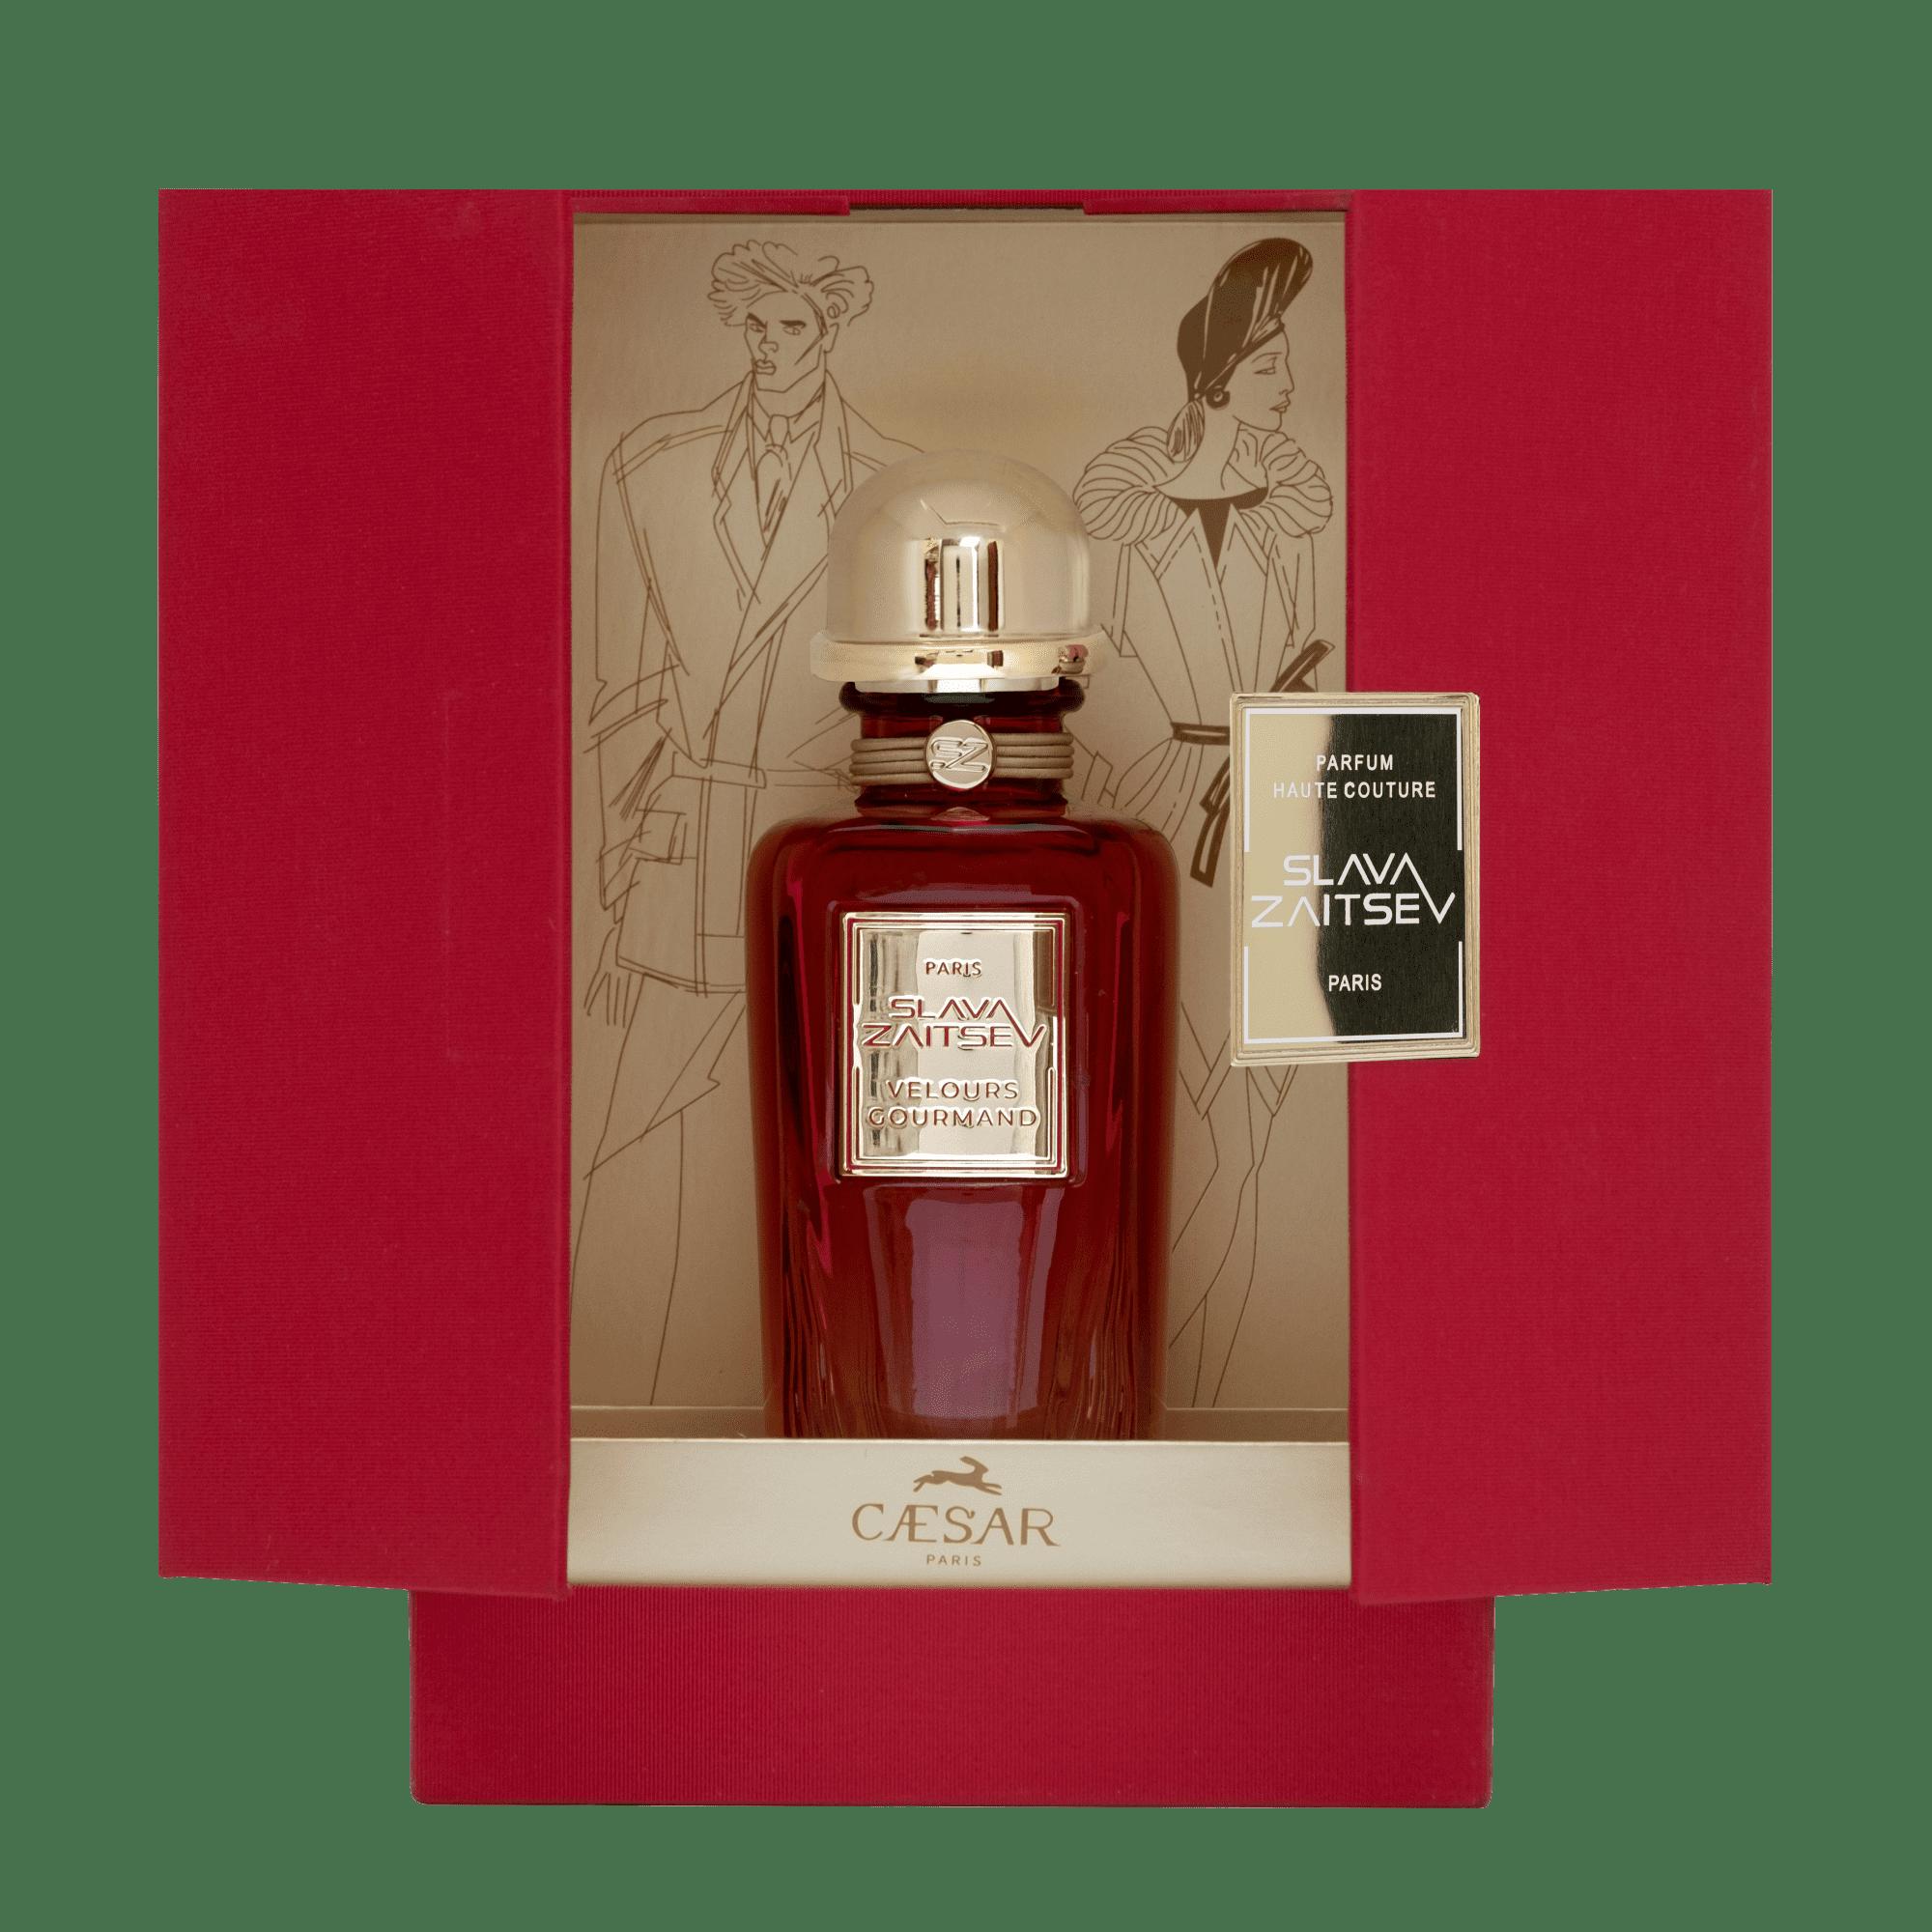 Упаковка духов Слава Зайцев - Изысканный бархат